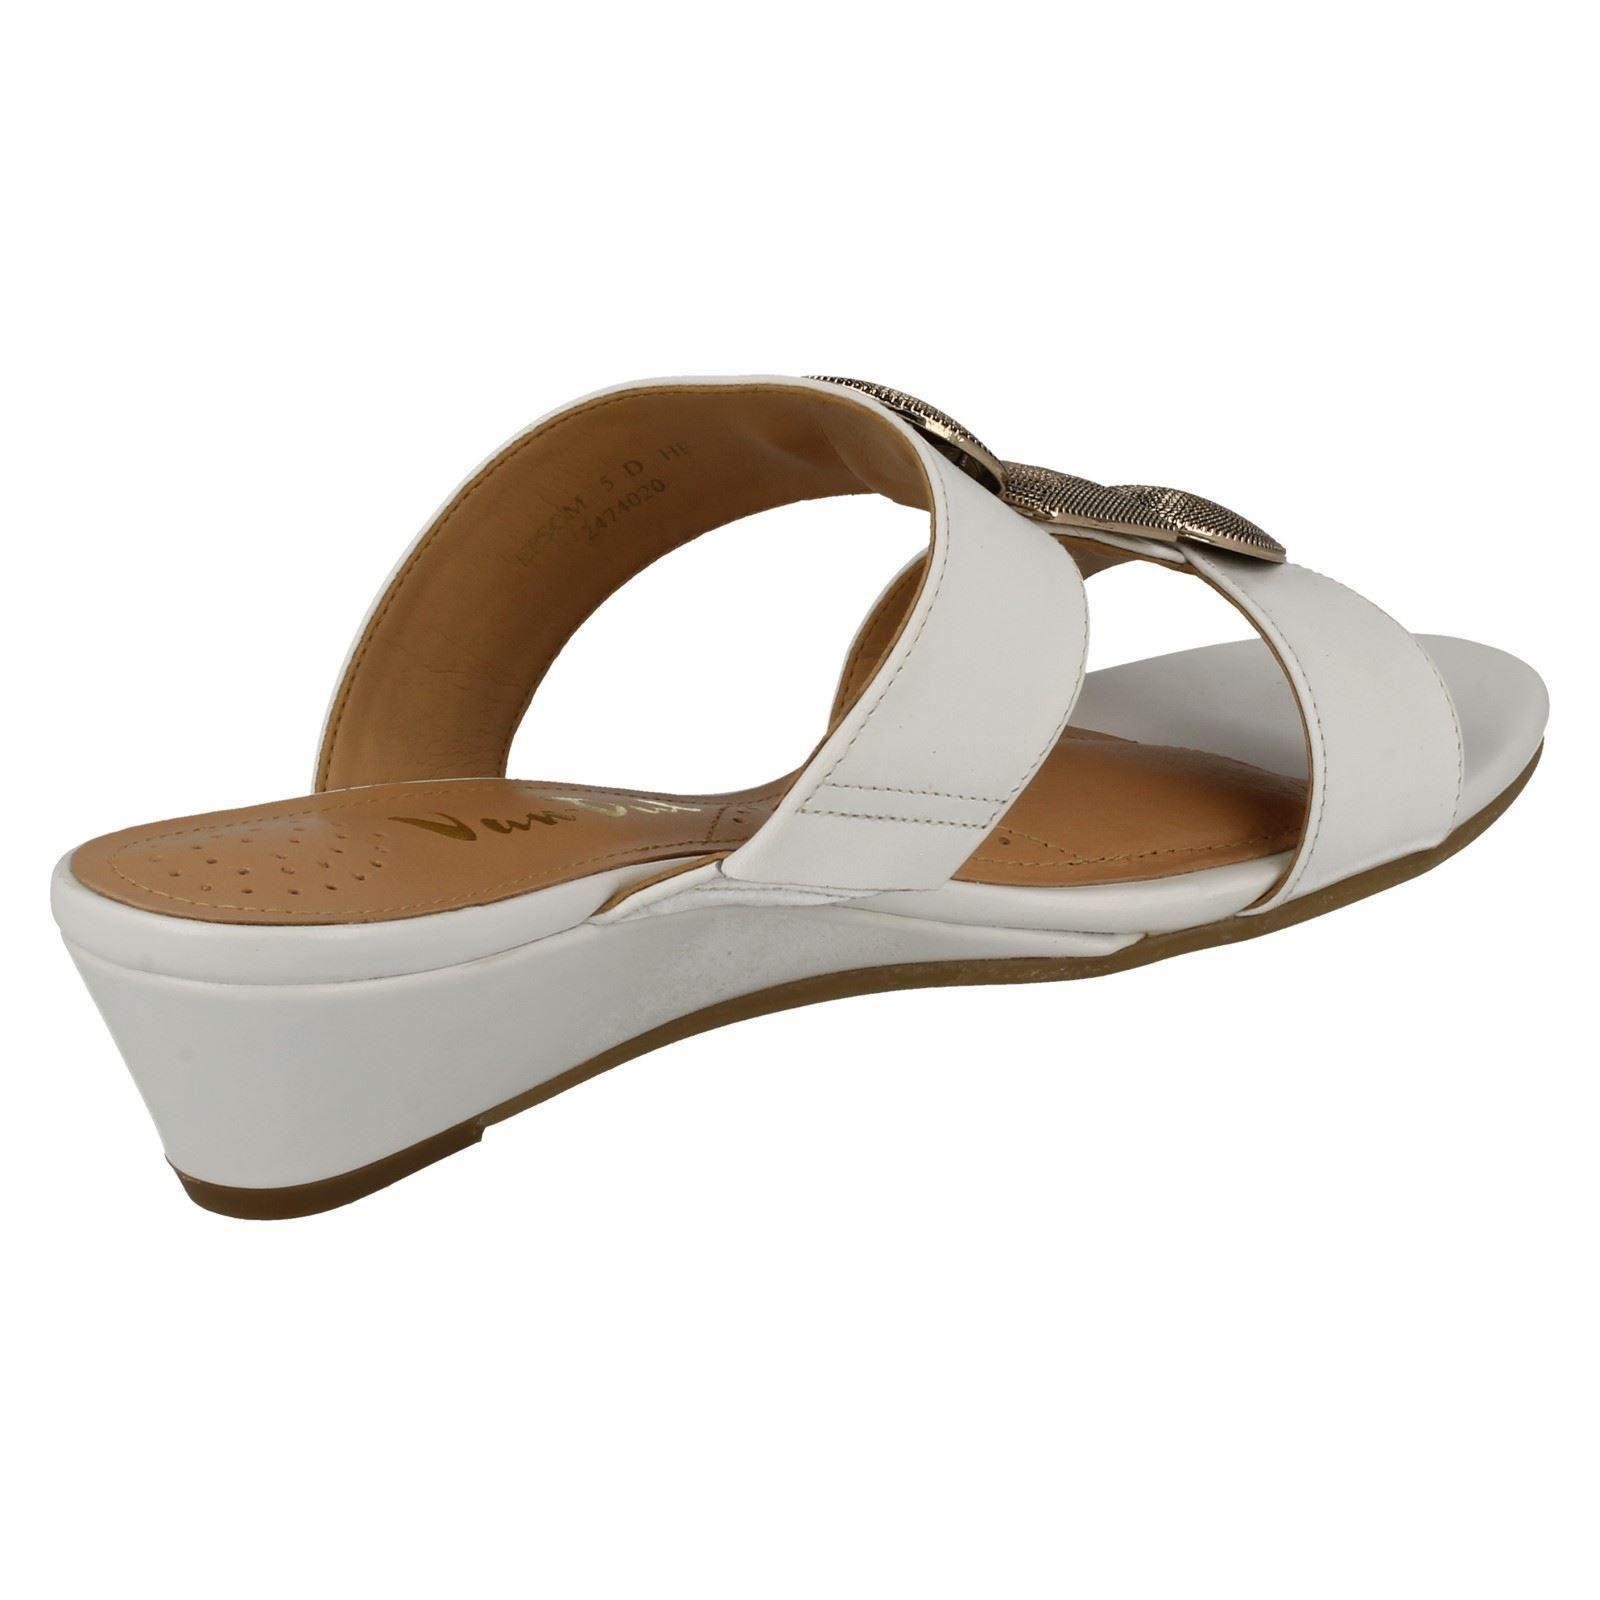 Ladies-Van-Dal-Open-Toe-Slip-On-Summer-Low-Wedge-Leather-Sandals-Epsom thumbnail 6